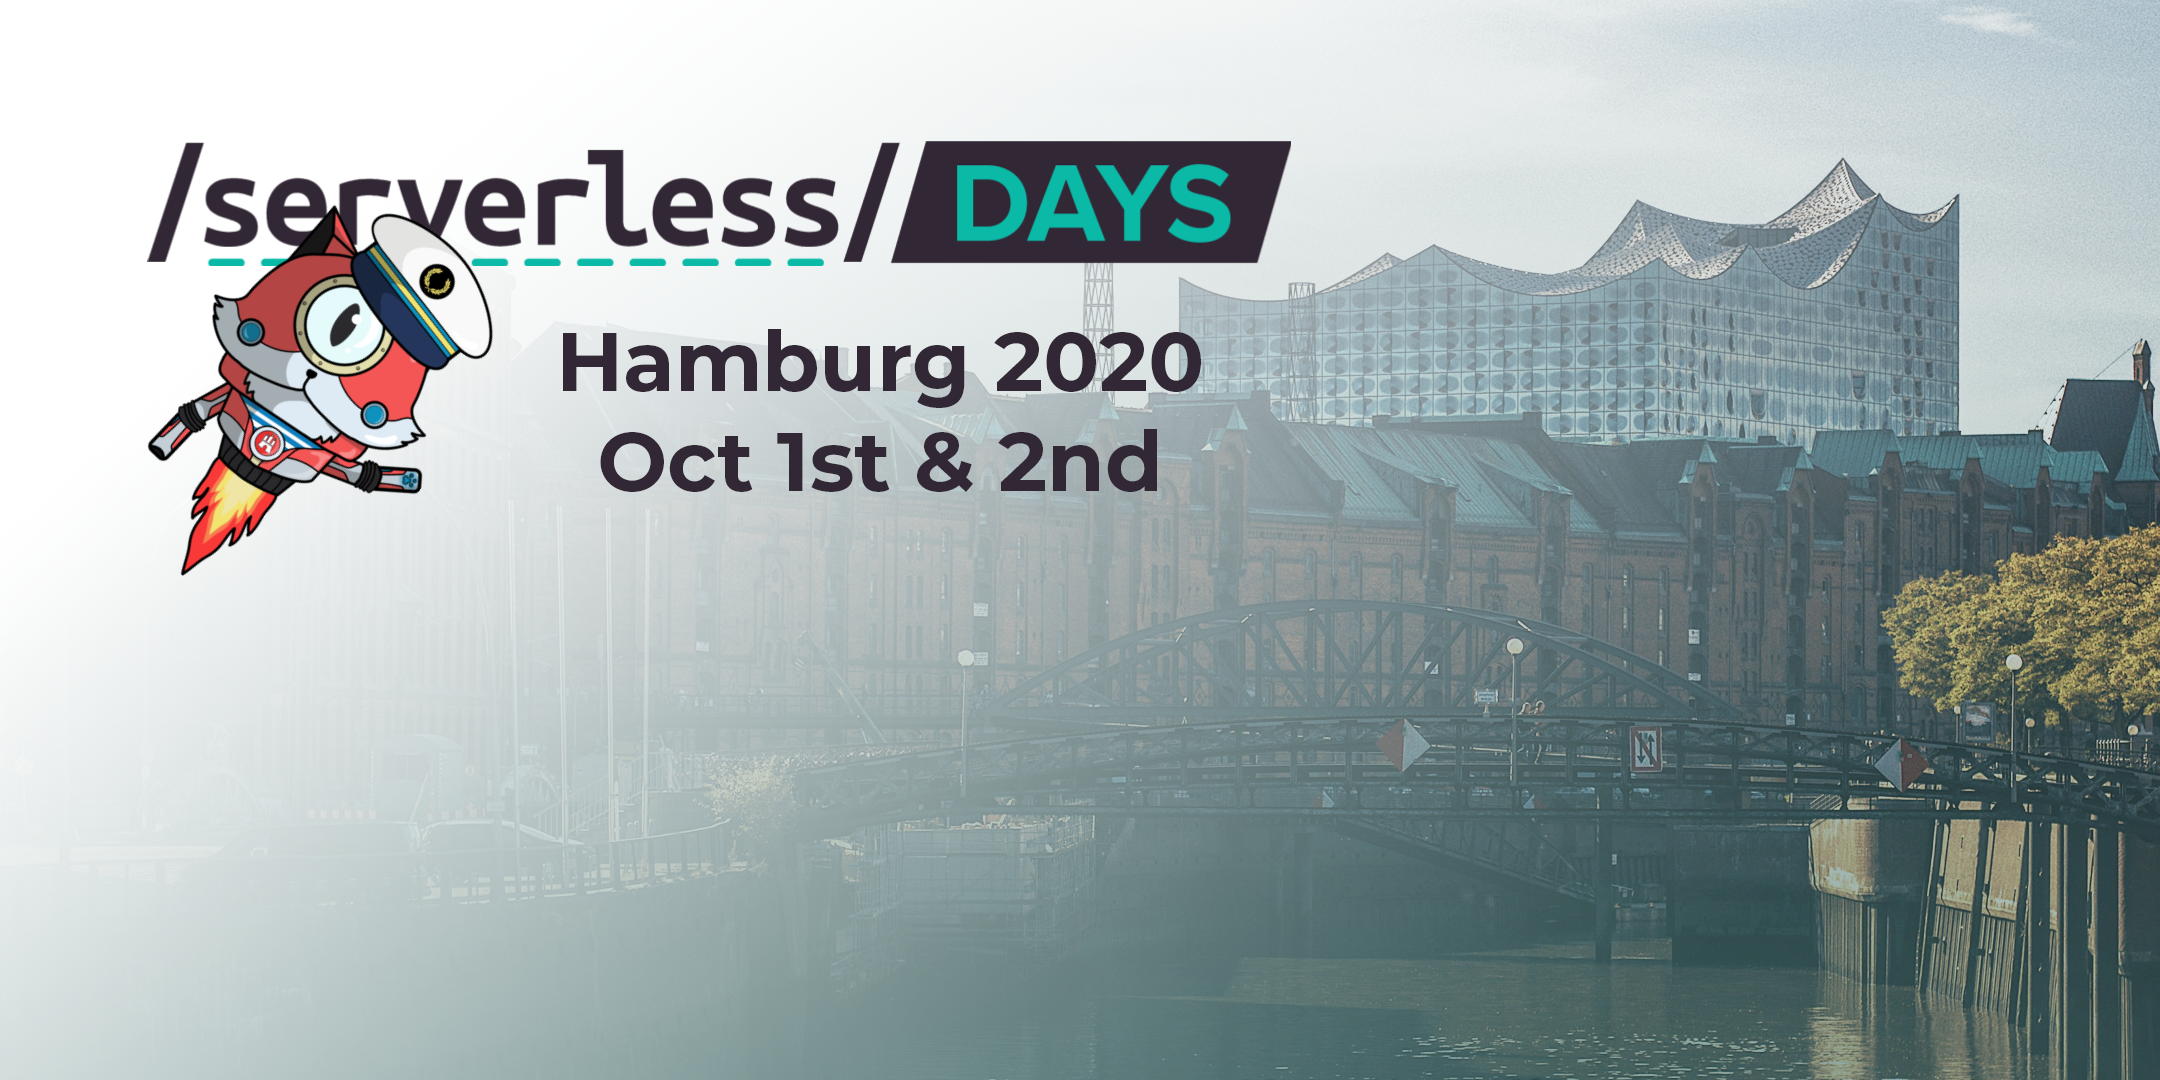 ServerlessDays Hamburg 2020